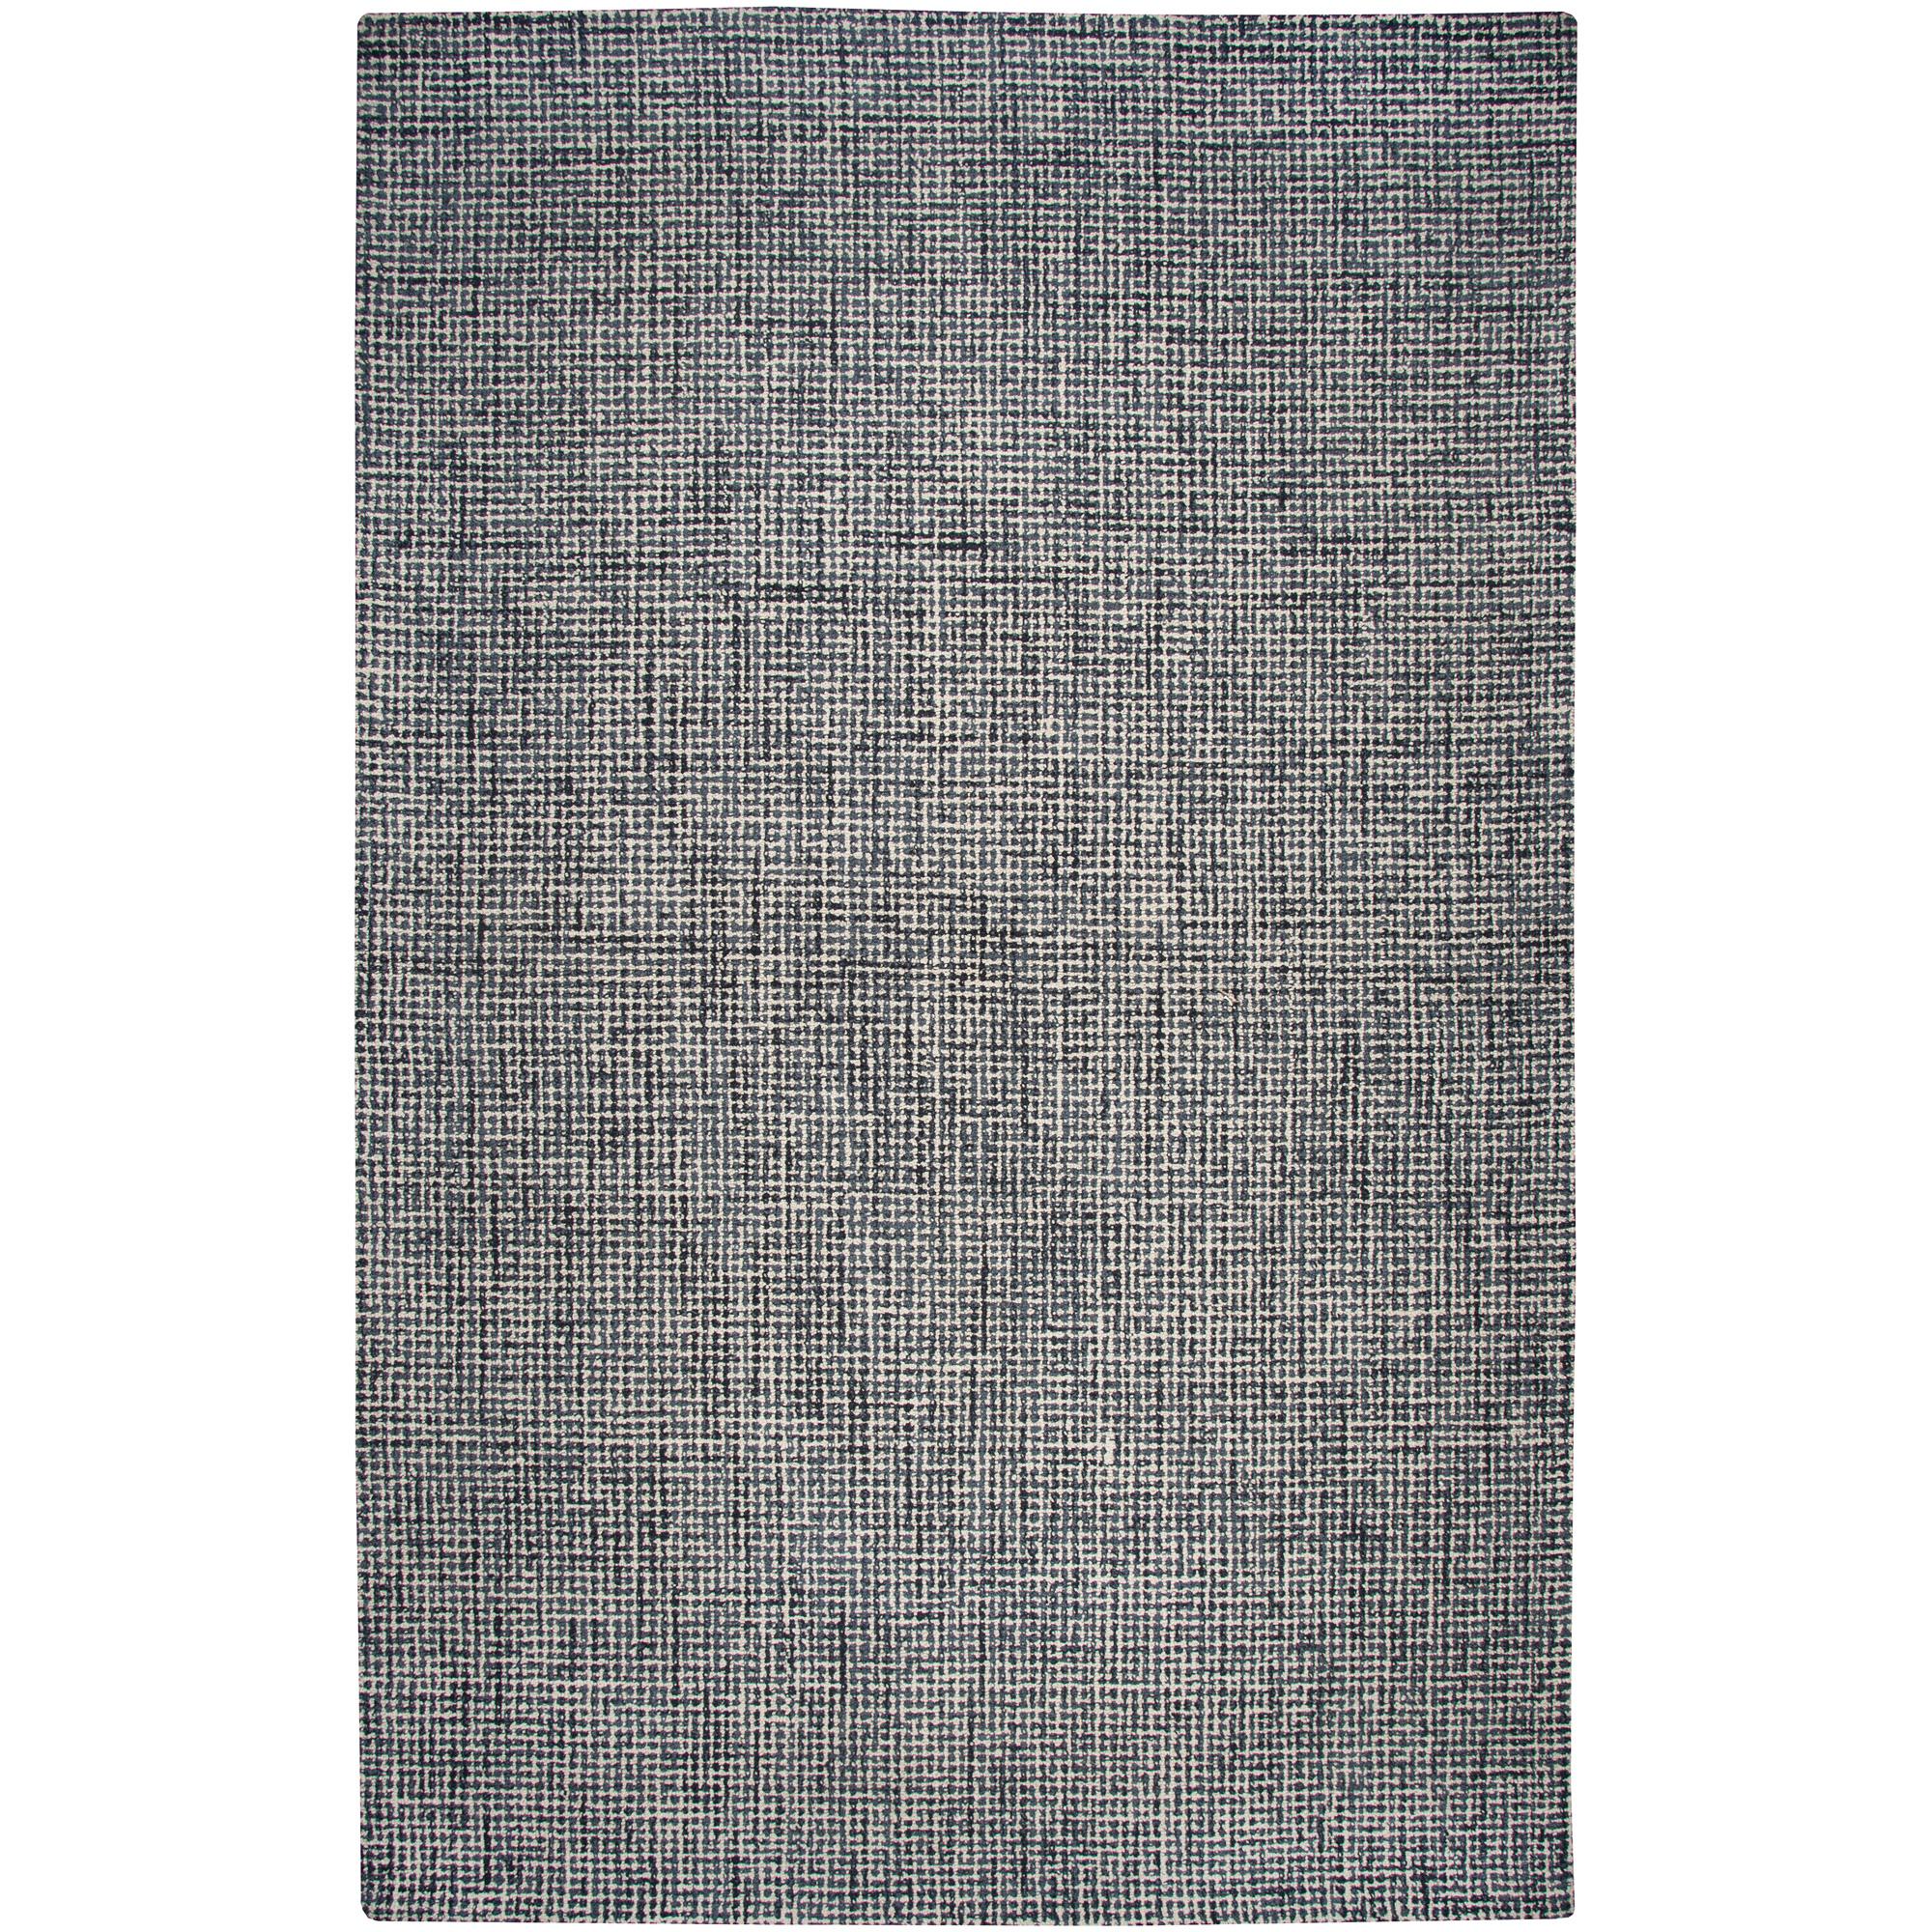 Rizzy Home | Brindleton Black 3x5 Area Rug